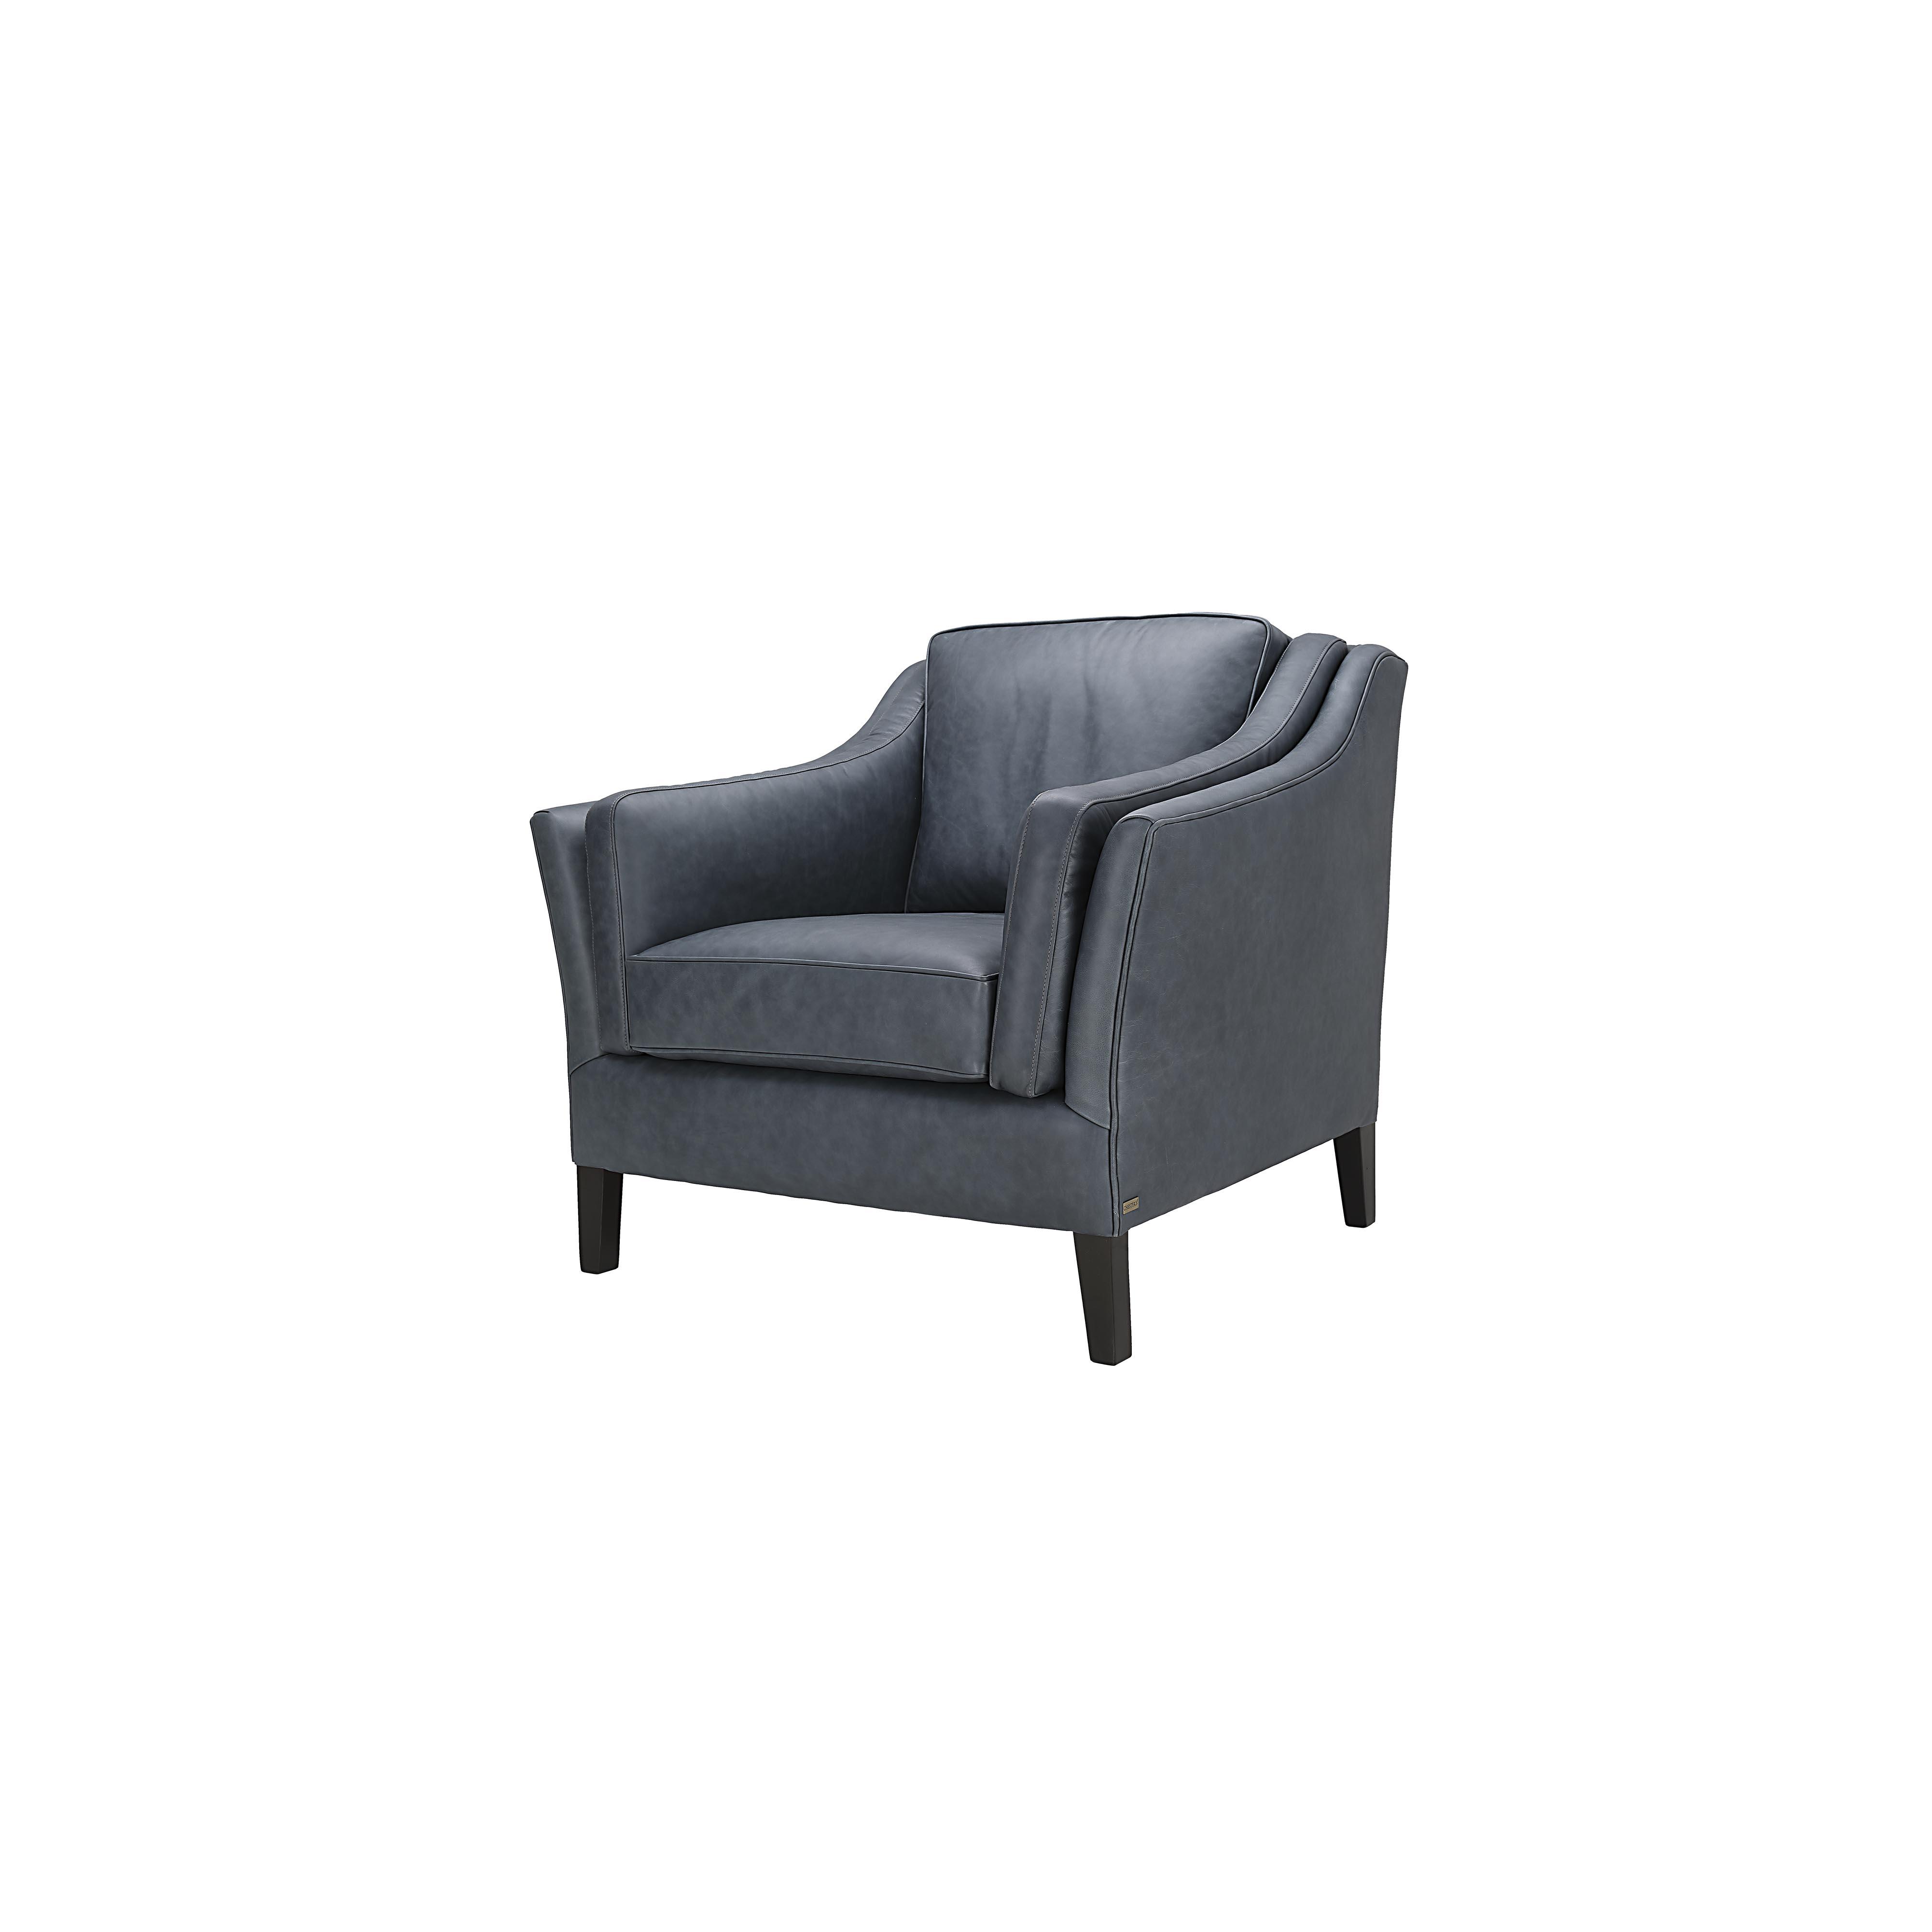 Montera armchair